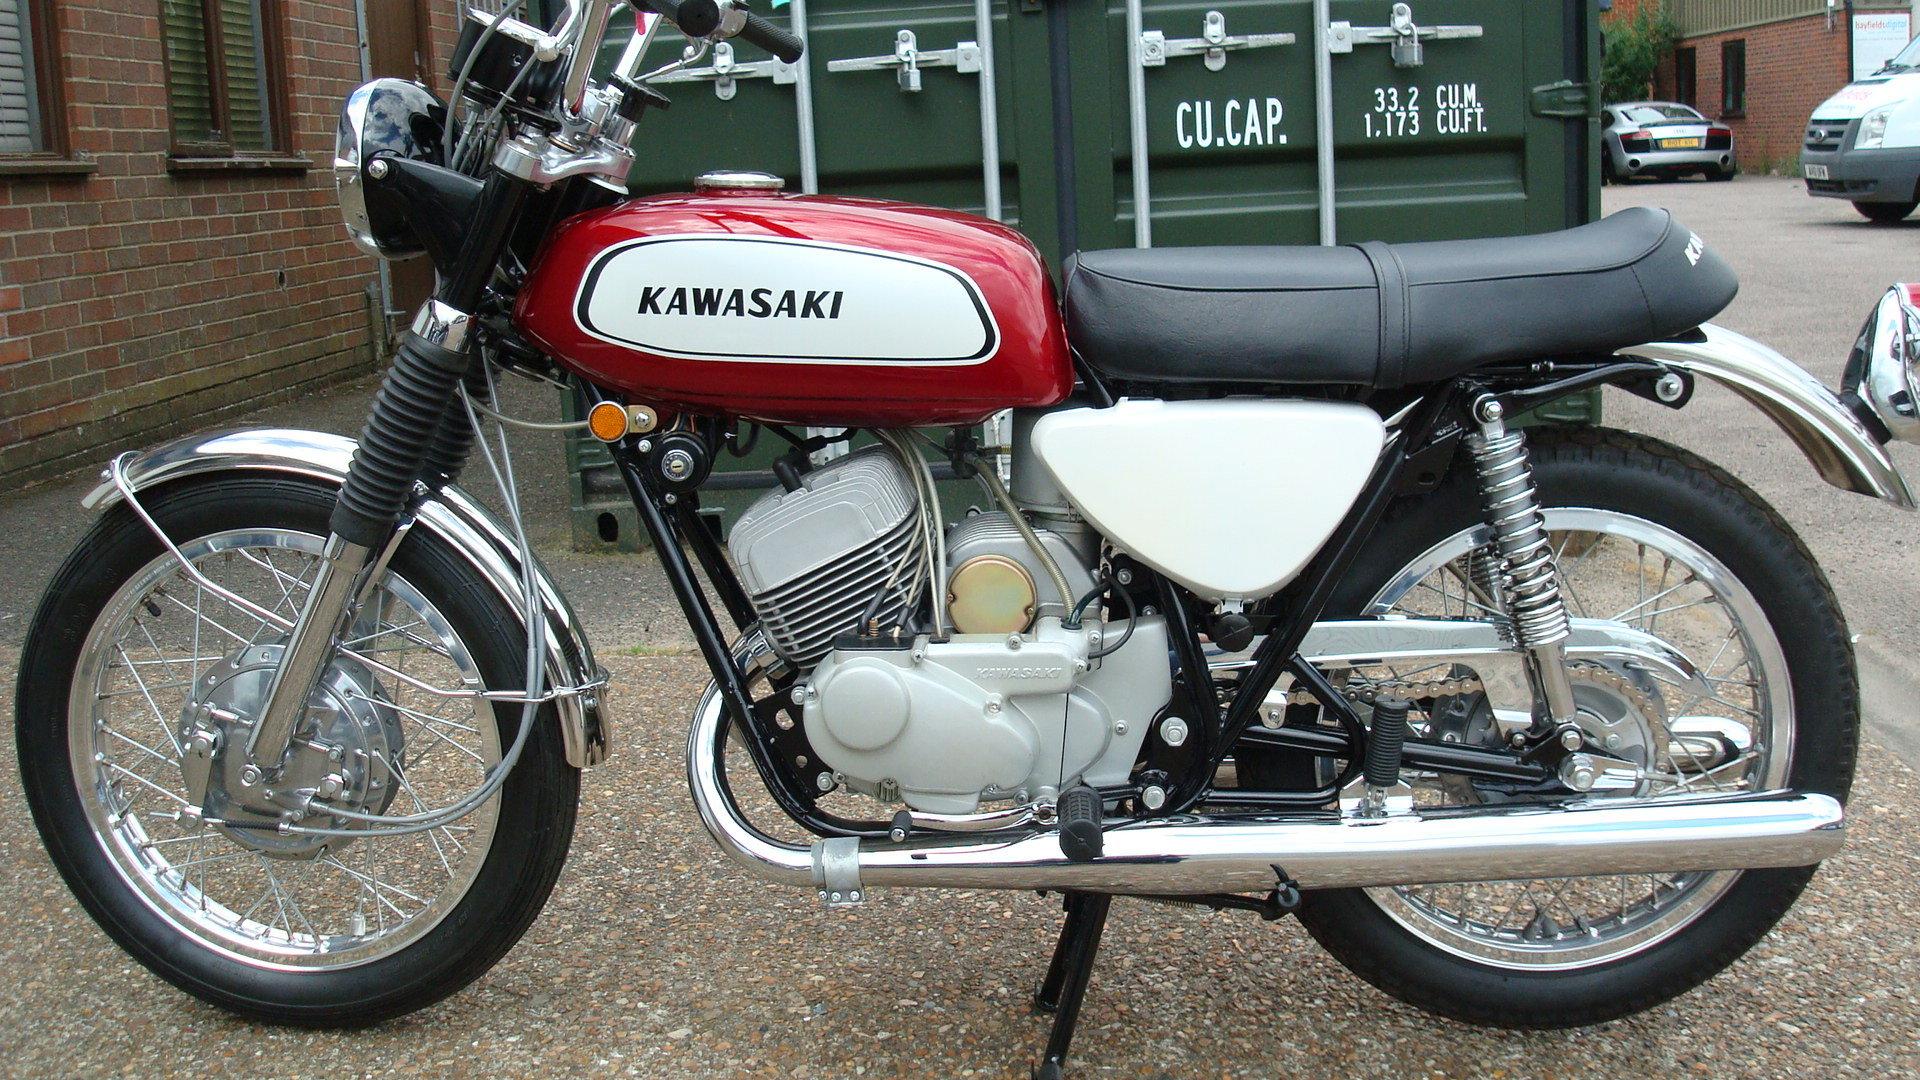 Kawasaki A1A Samurai 250 1970-J **SHOW STANDARD,RESTORED** For Sale (picture 6 of 6)